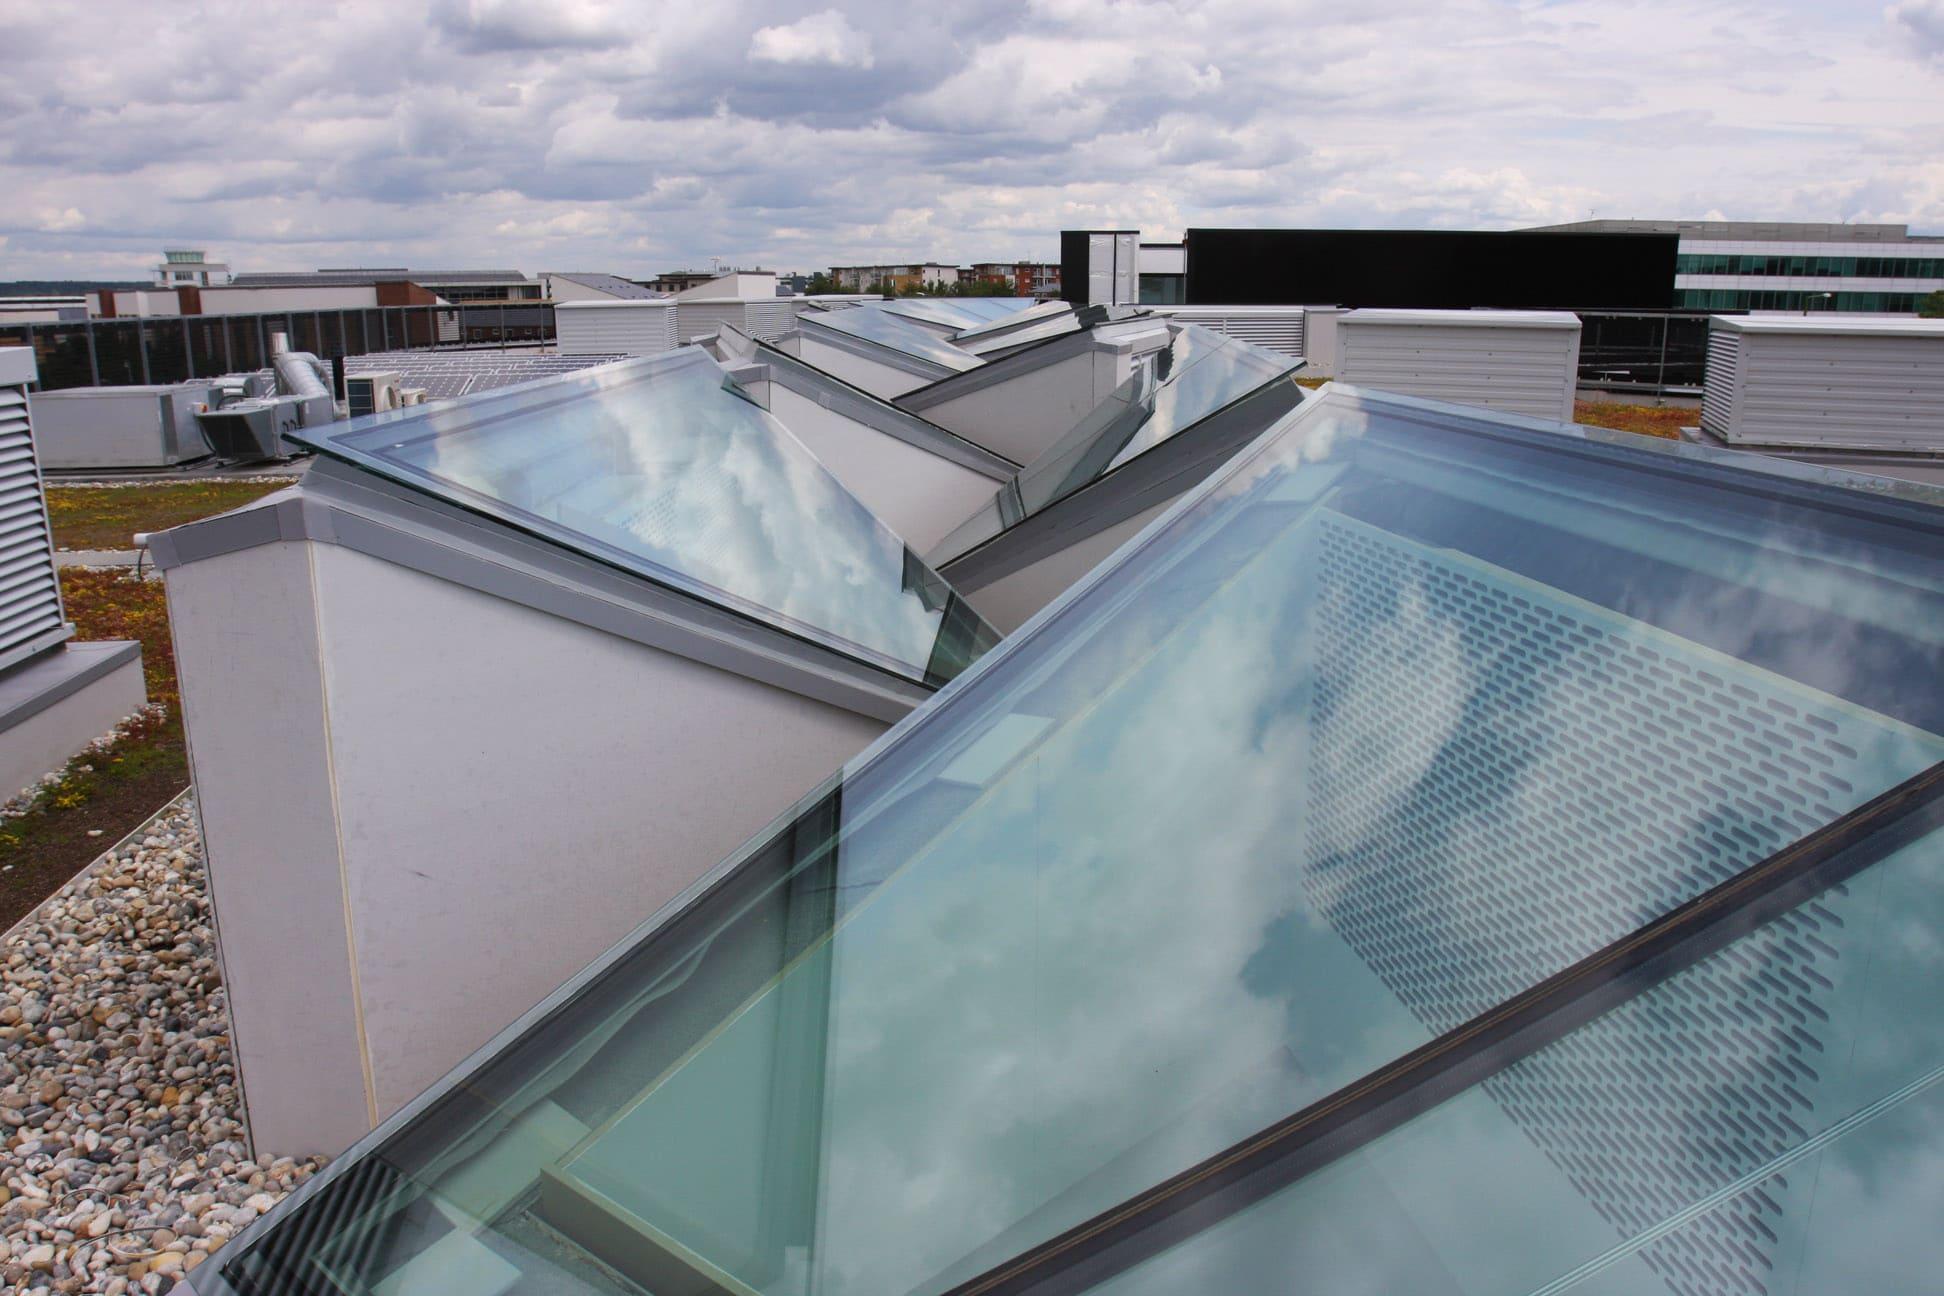 Bespoke venting rooflight in triangular configuration